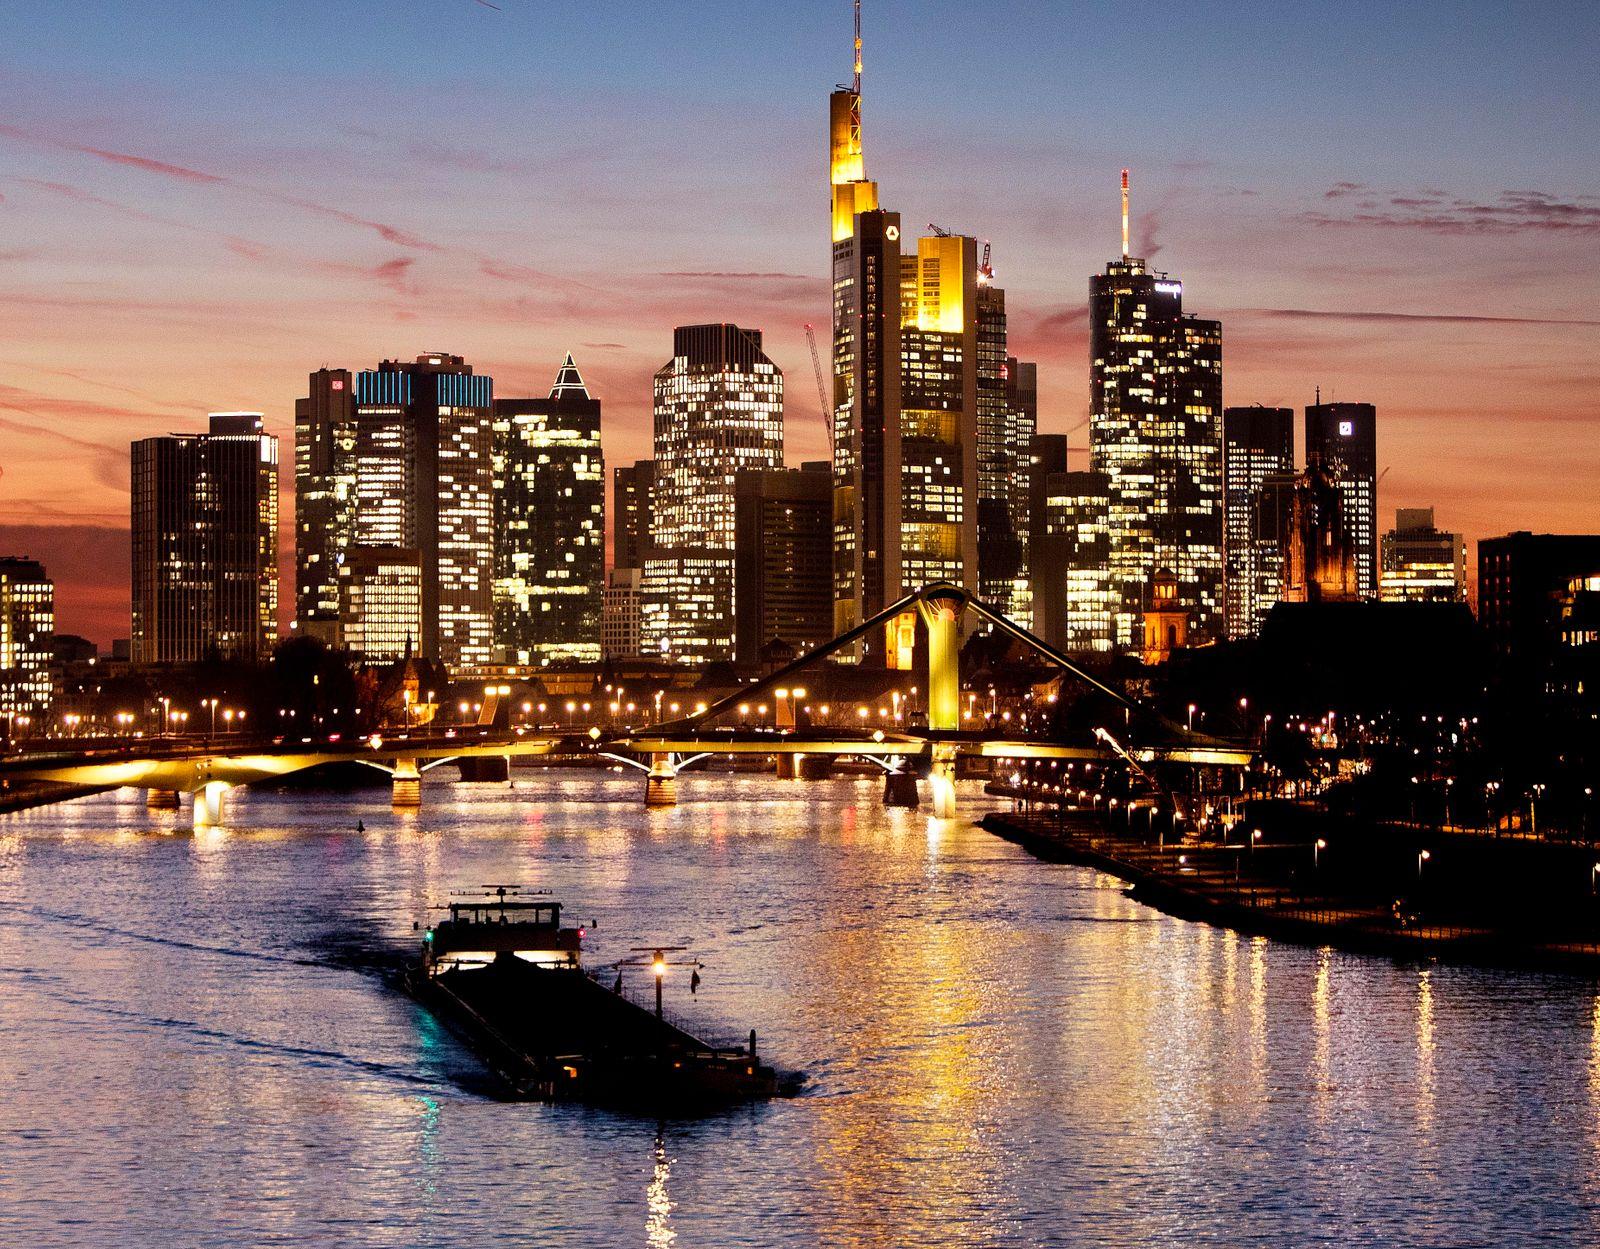 Frankfurt Skyline / Banken / Banken-Viertel / Konjunktur